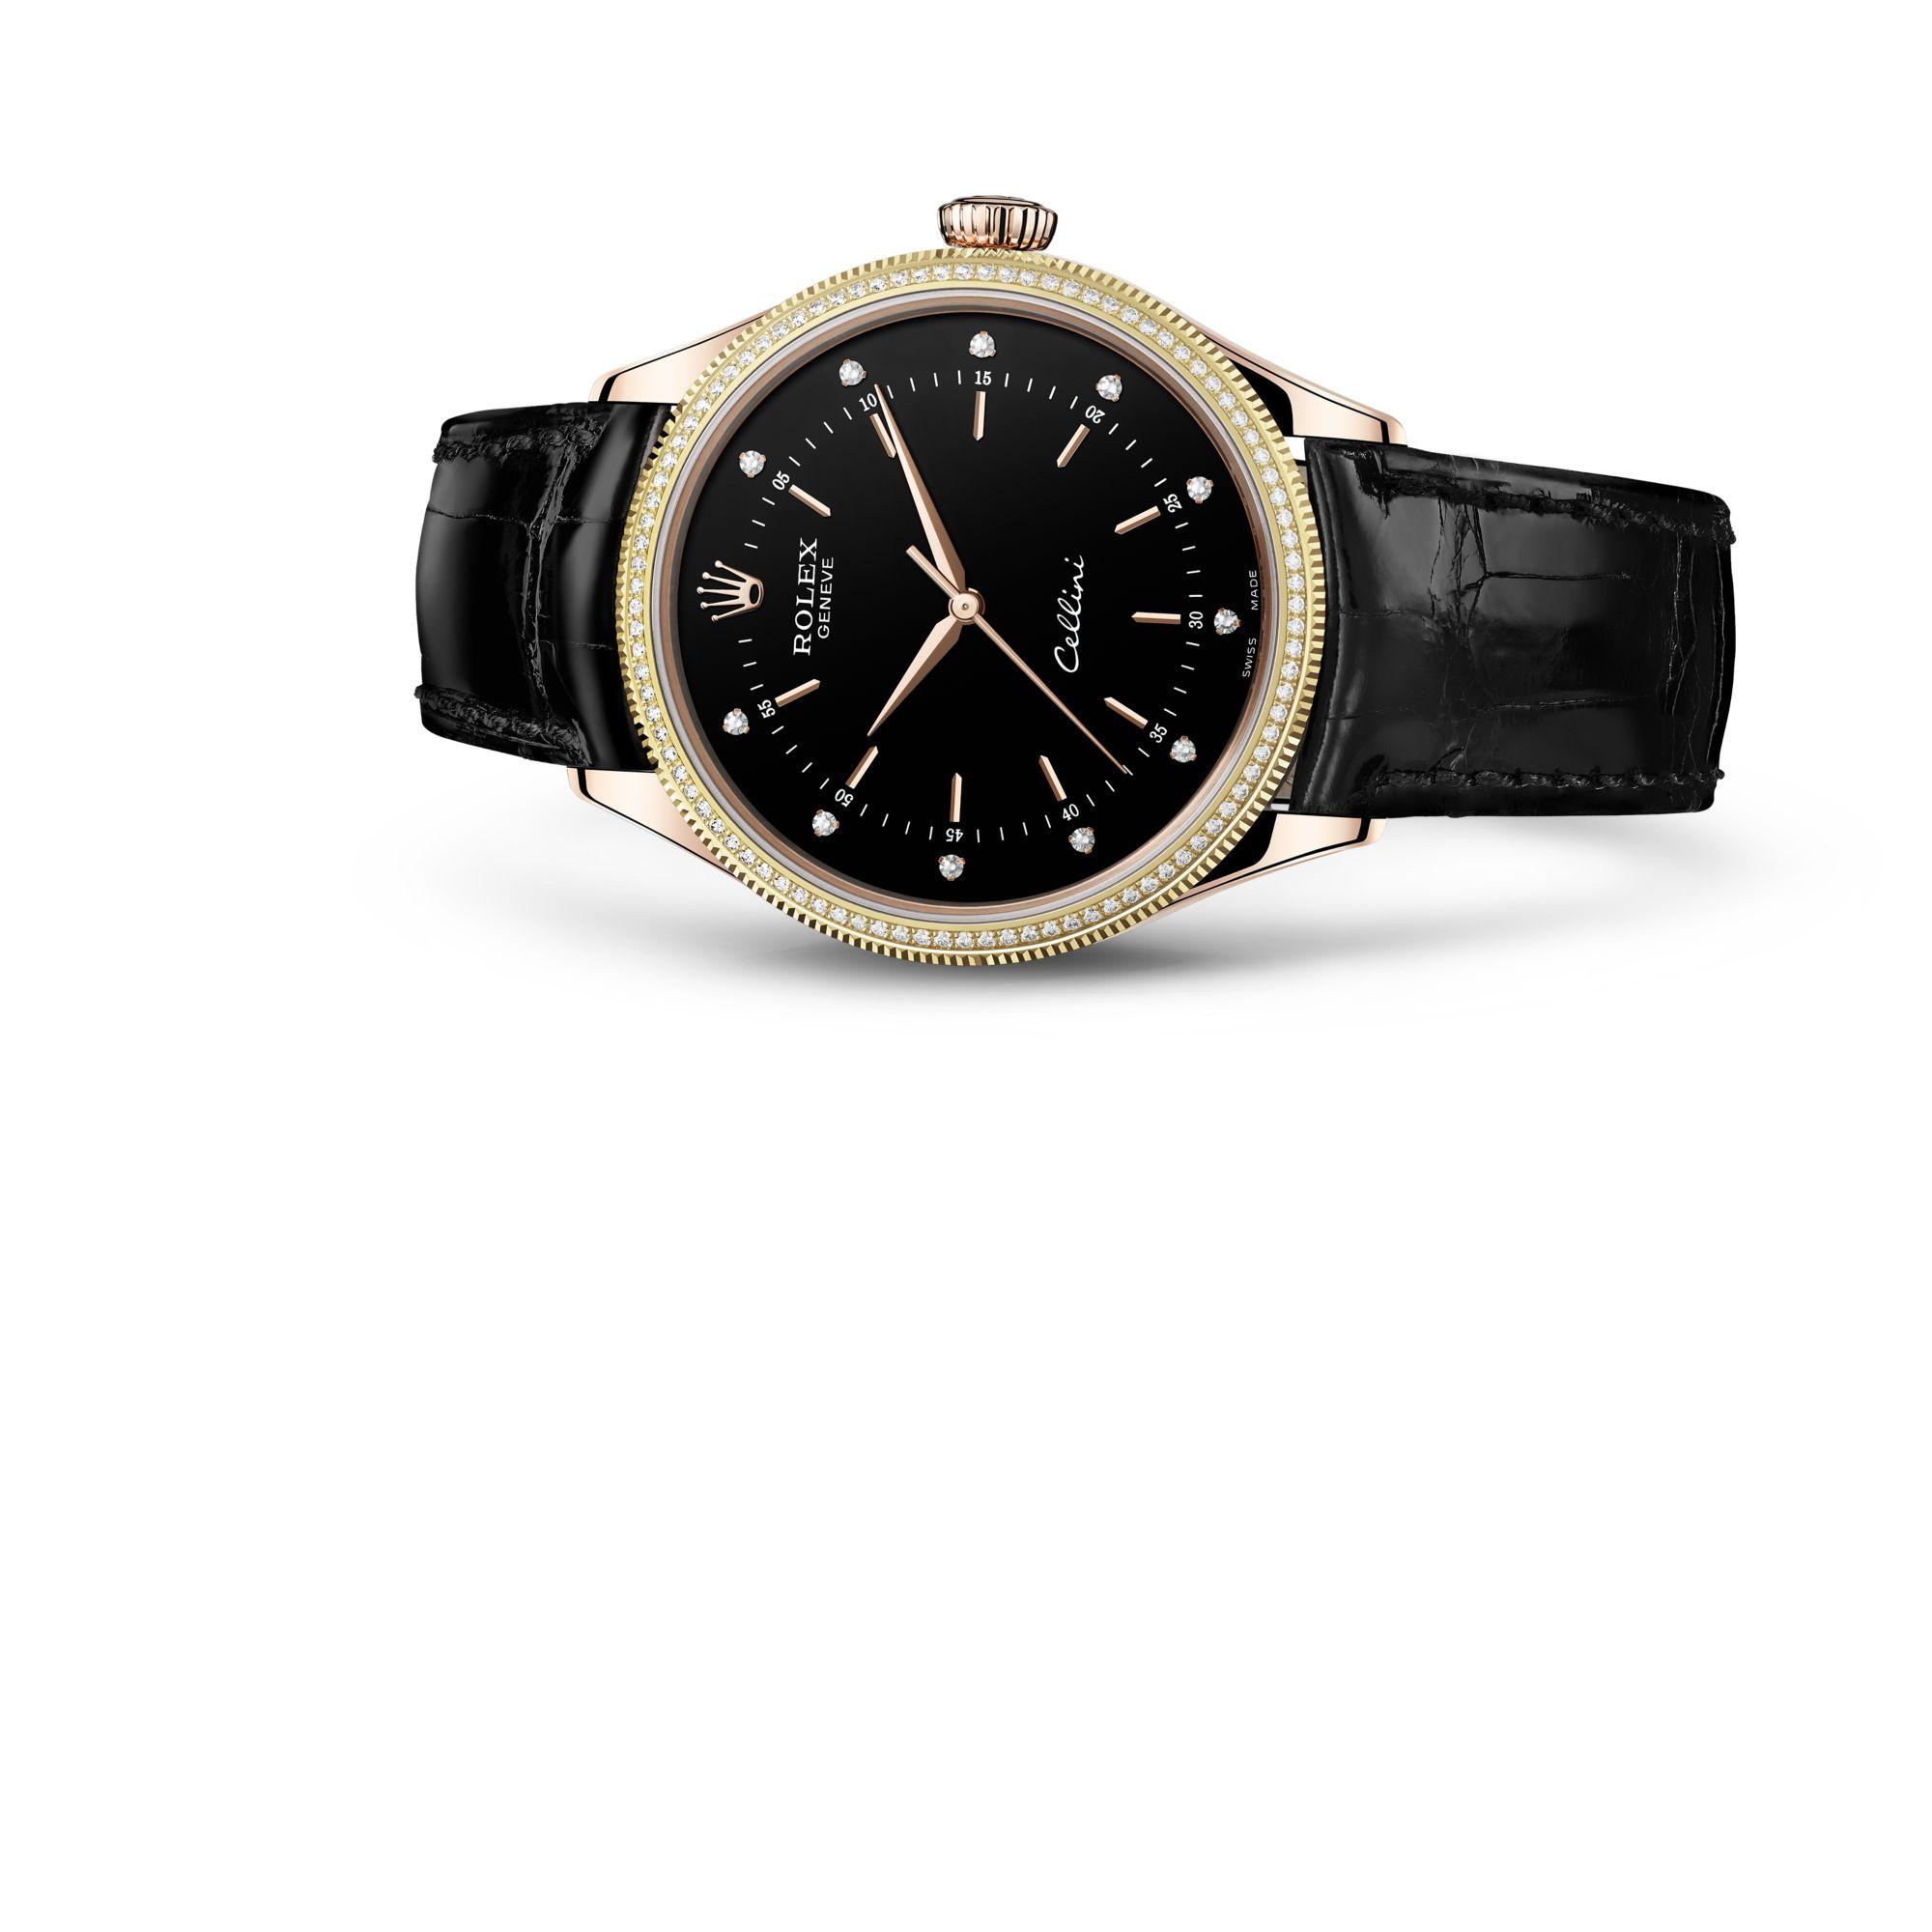 Rolex Cellini Time M50605RBR-0014